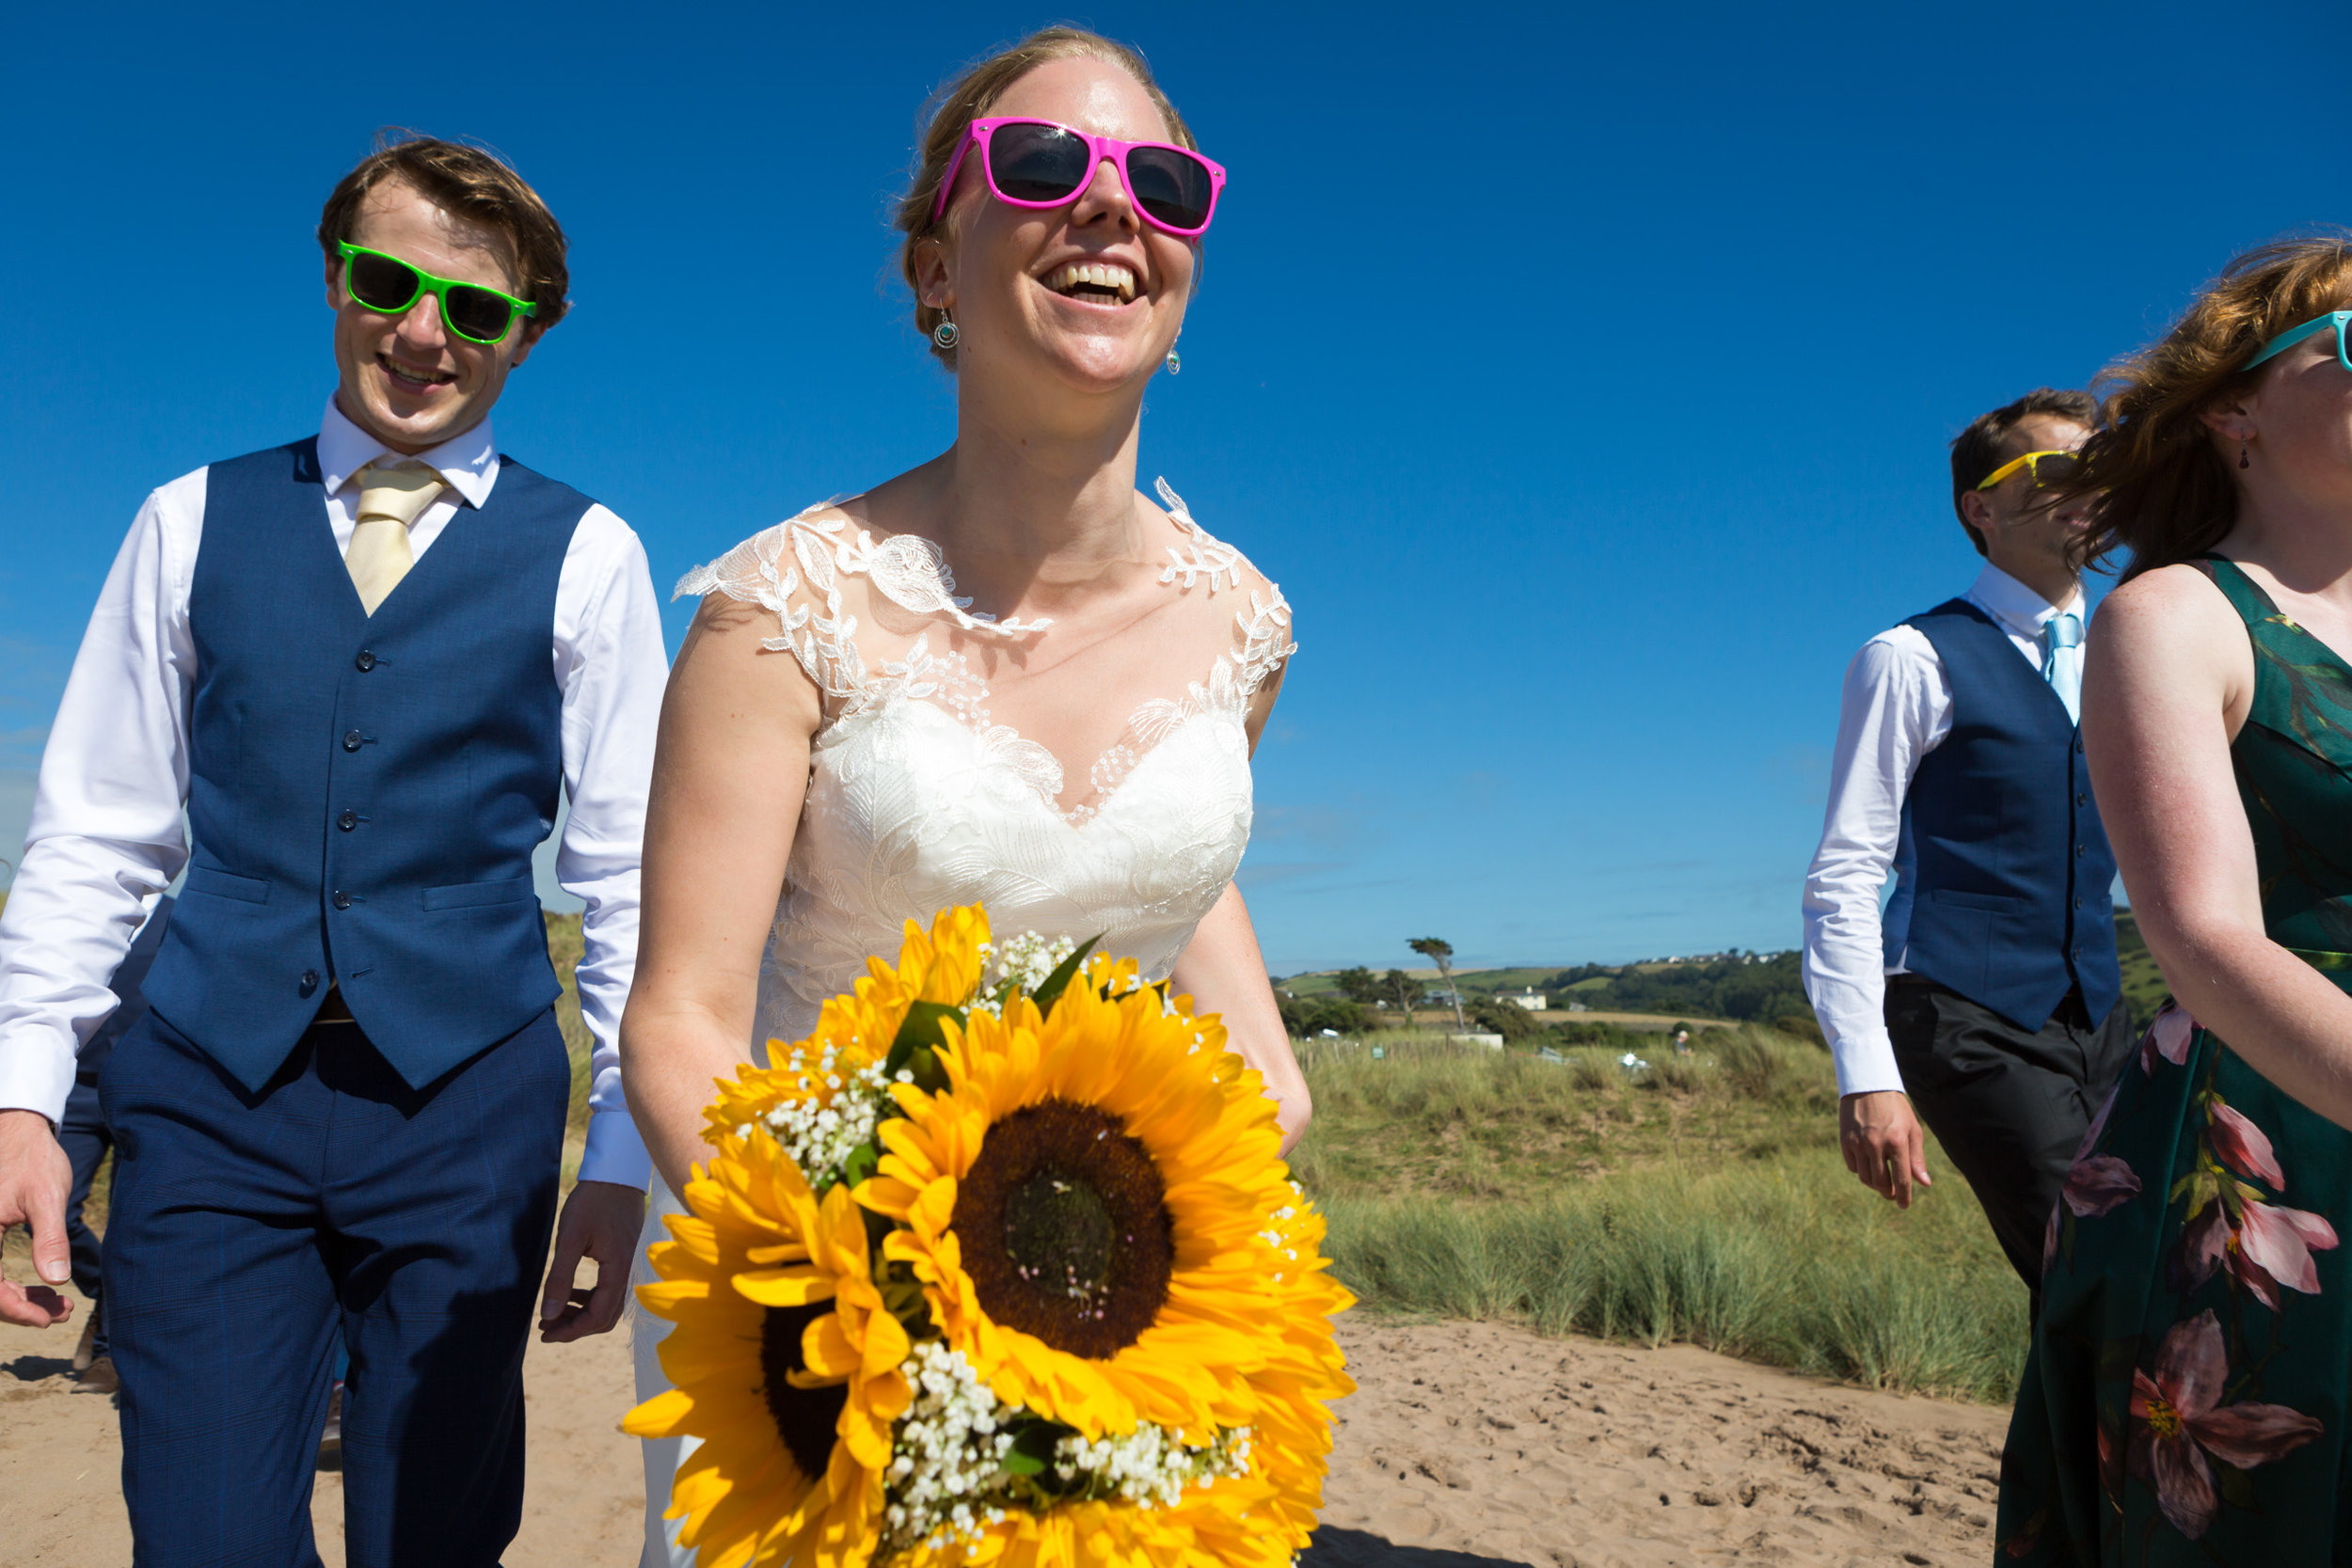 Bucklands-Tout-Saints-Hotel-Devon-Wedding-Photography-22.jpg